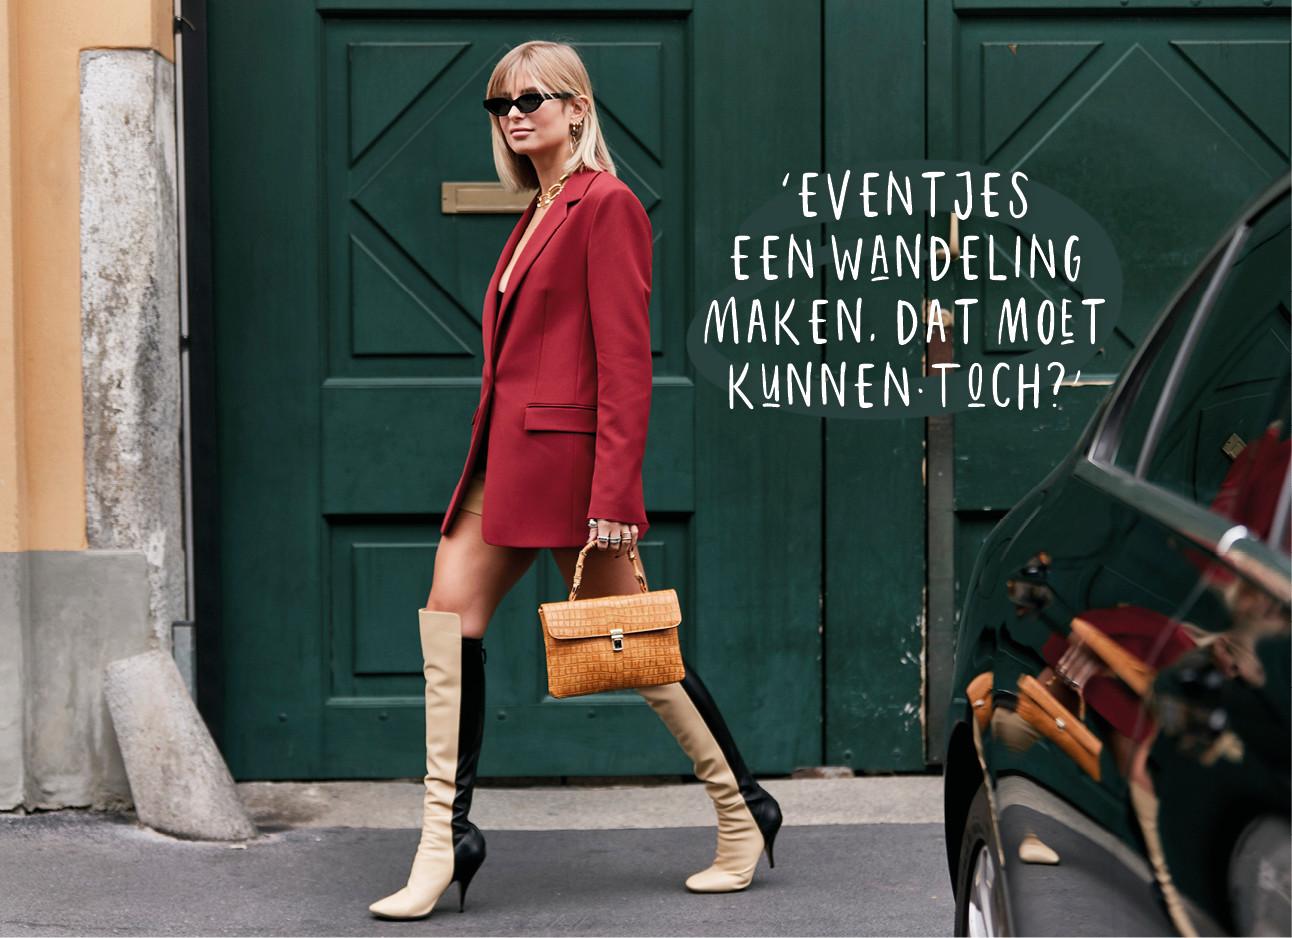 Modemeisje lopend over straat in rode colbert